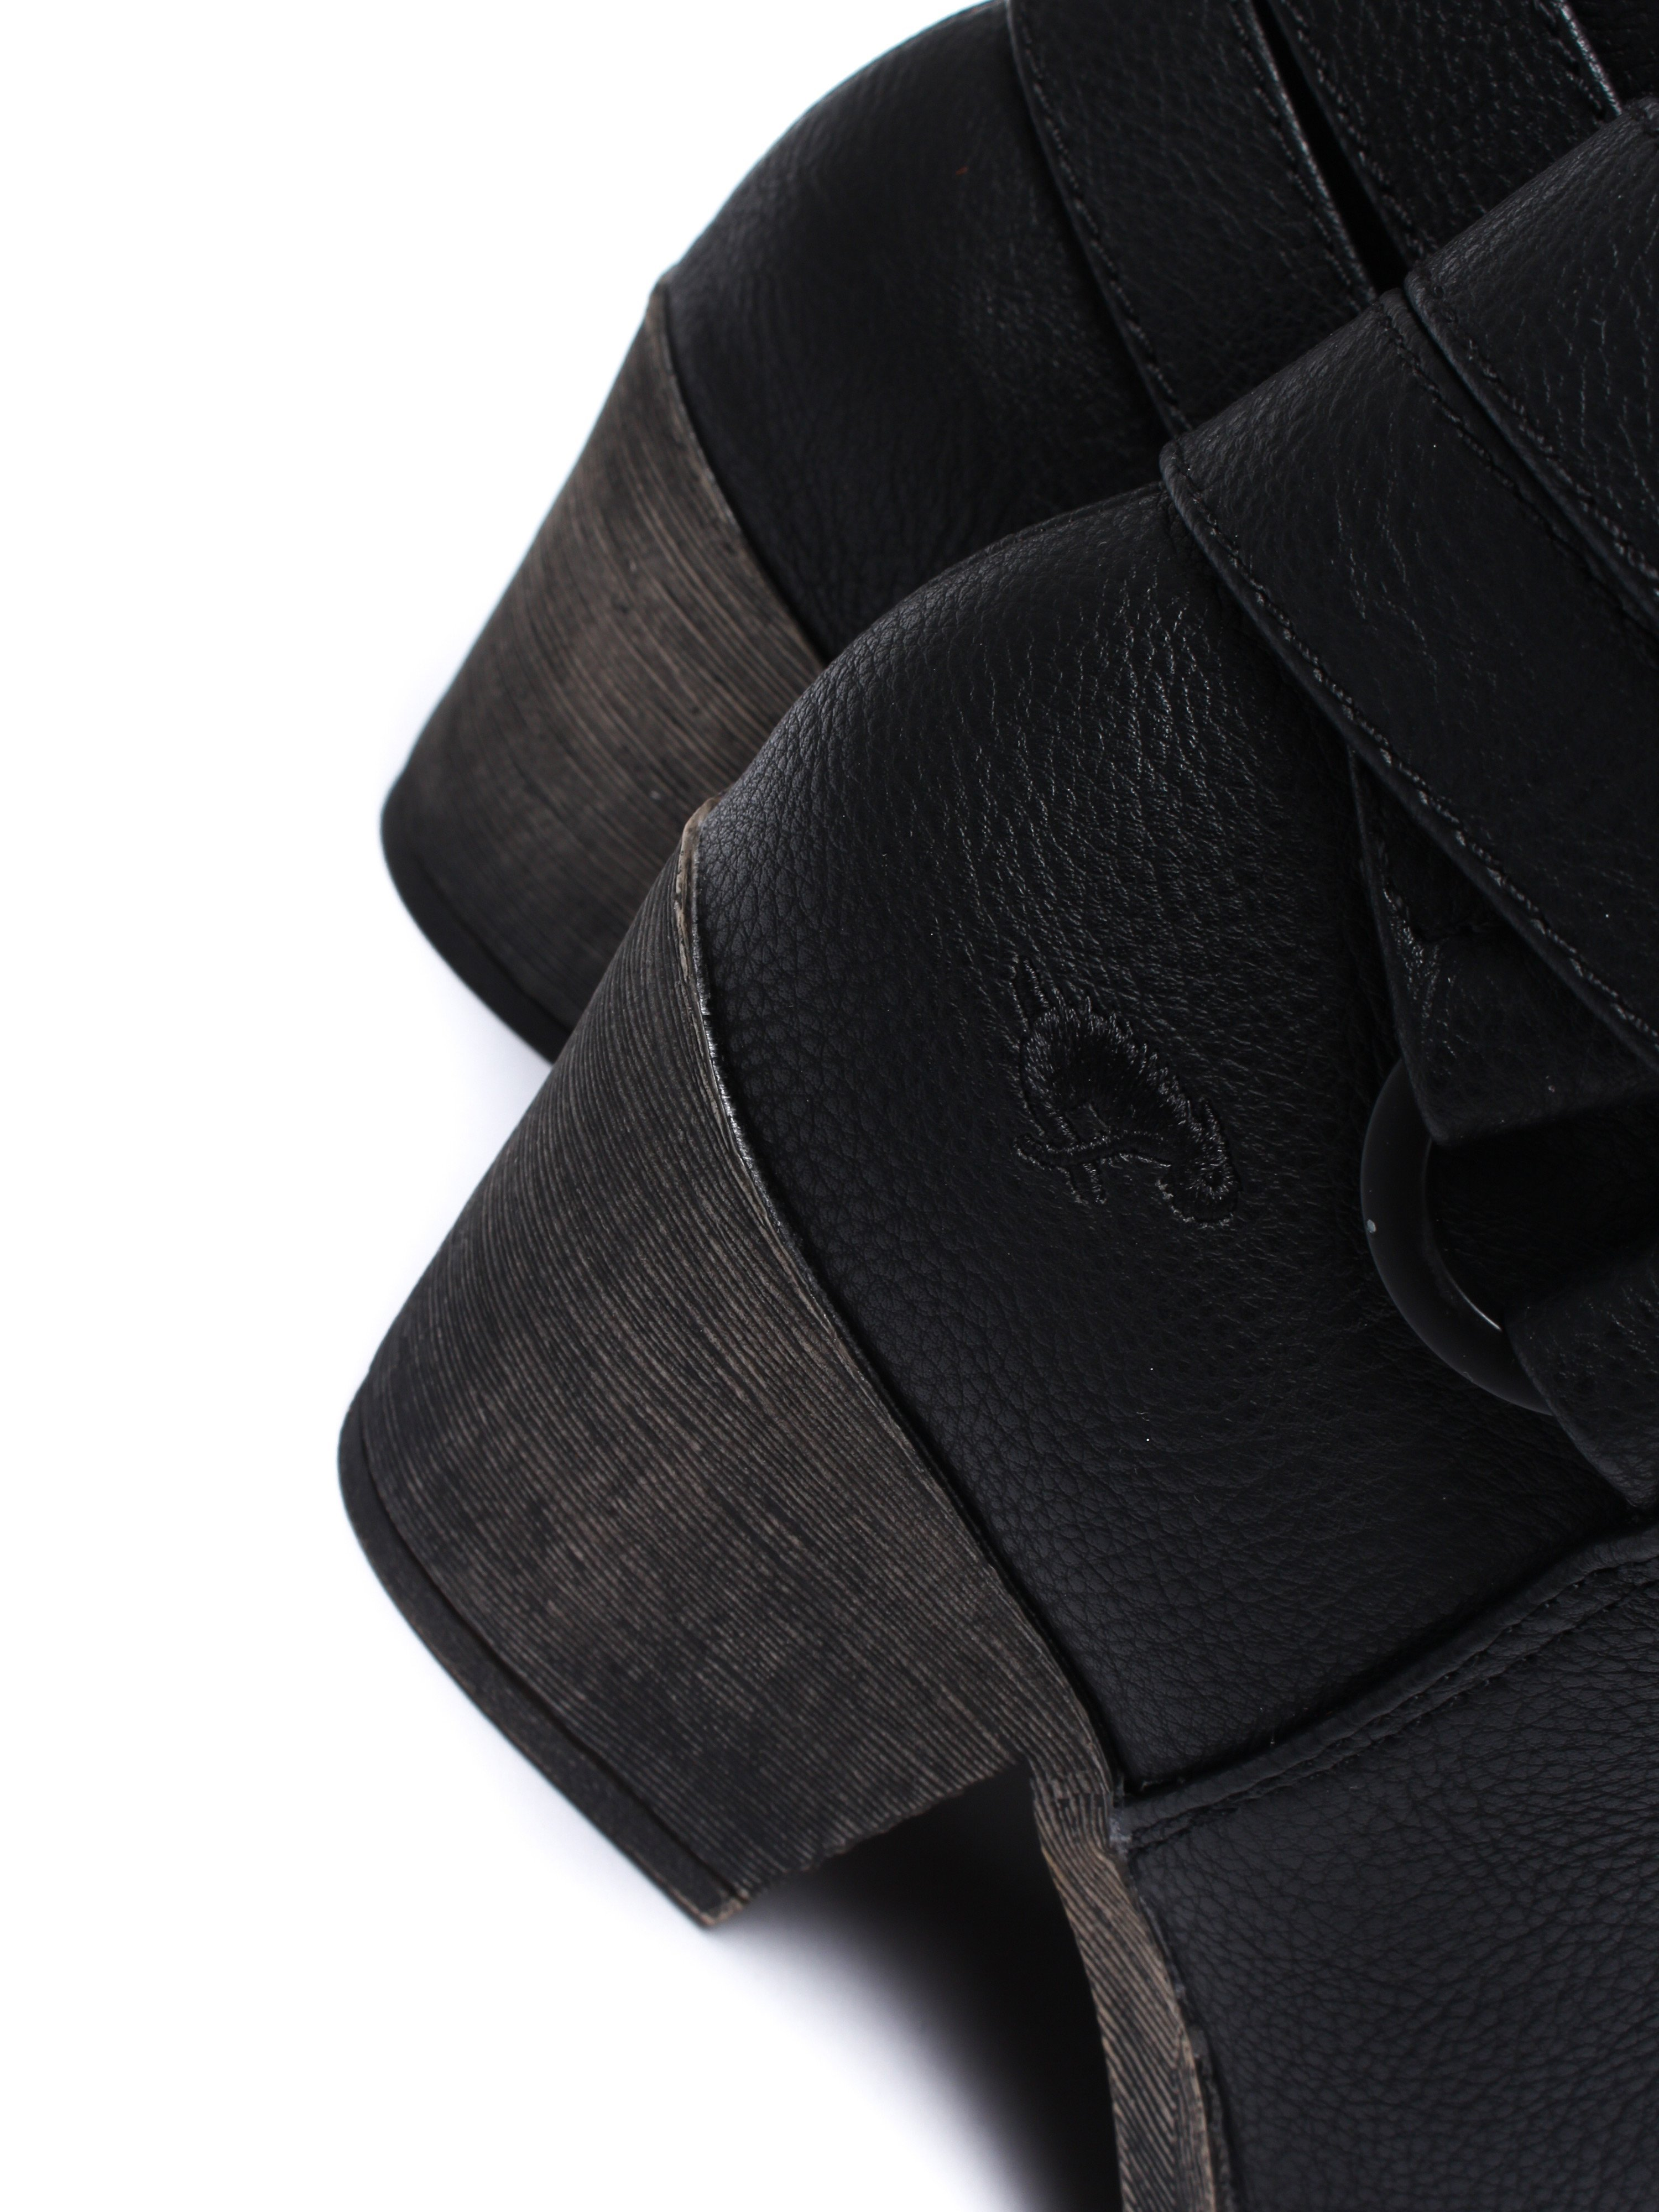 Rocket Dog Women's Salvador Dove Heeled Boots - Black